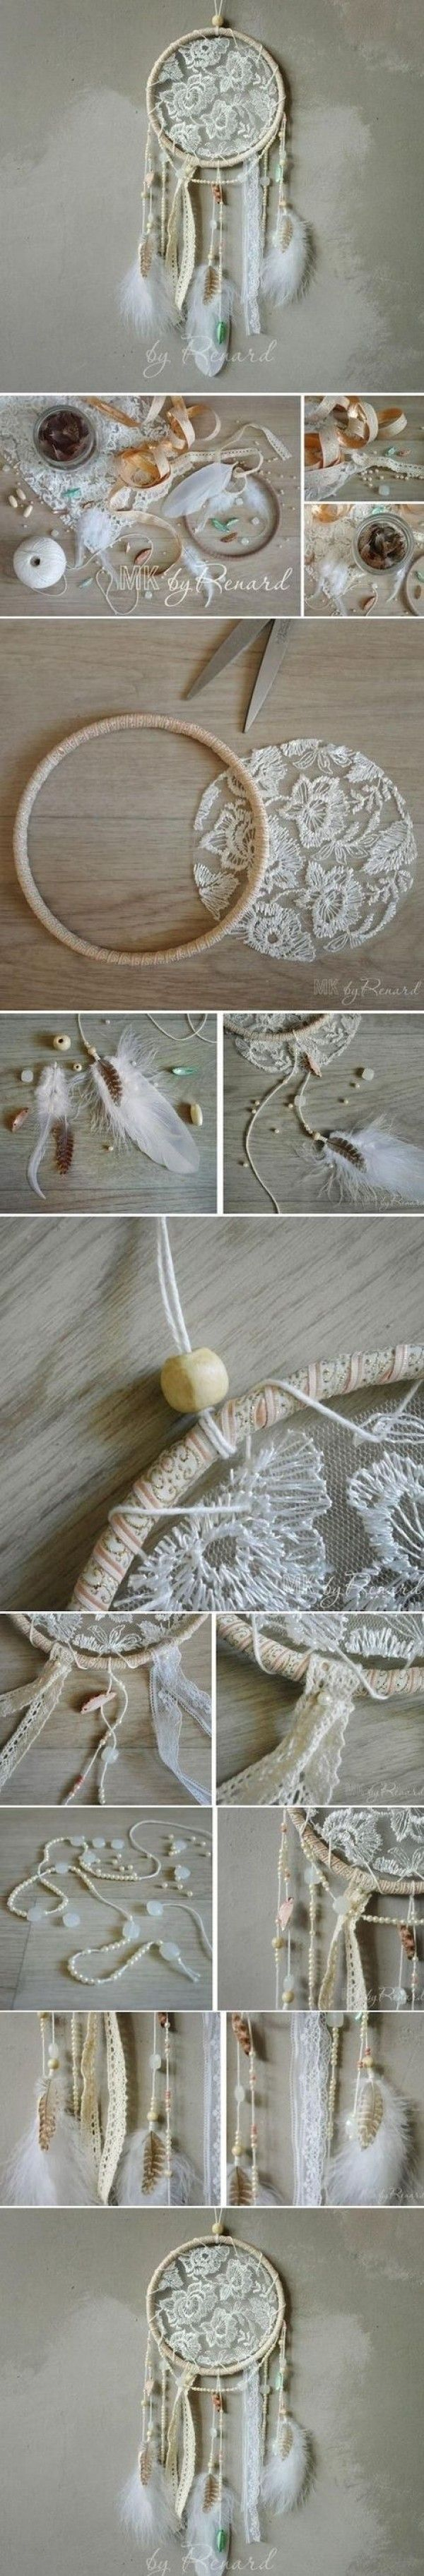 Check out the tutorial: #DIY Dream Catcher #crafts #homedecor